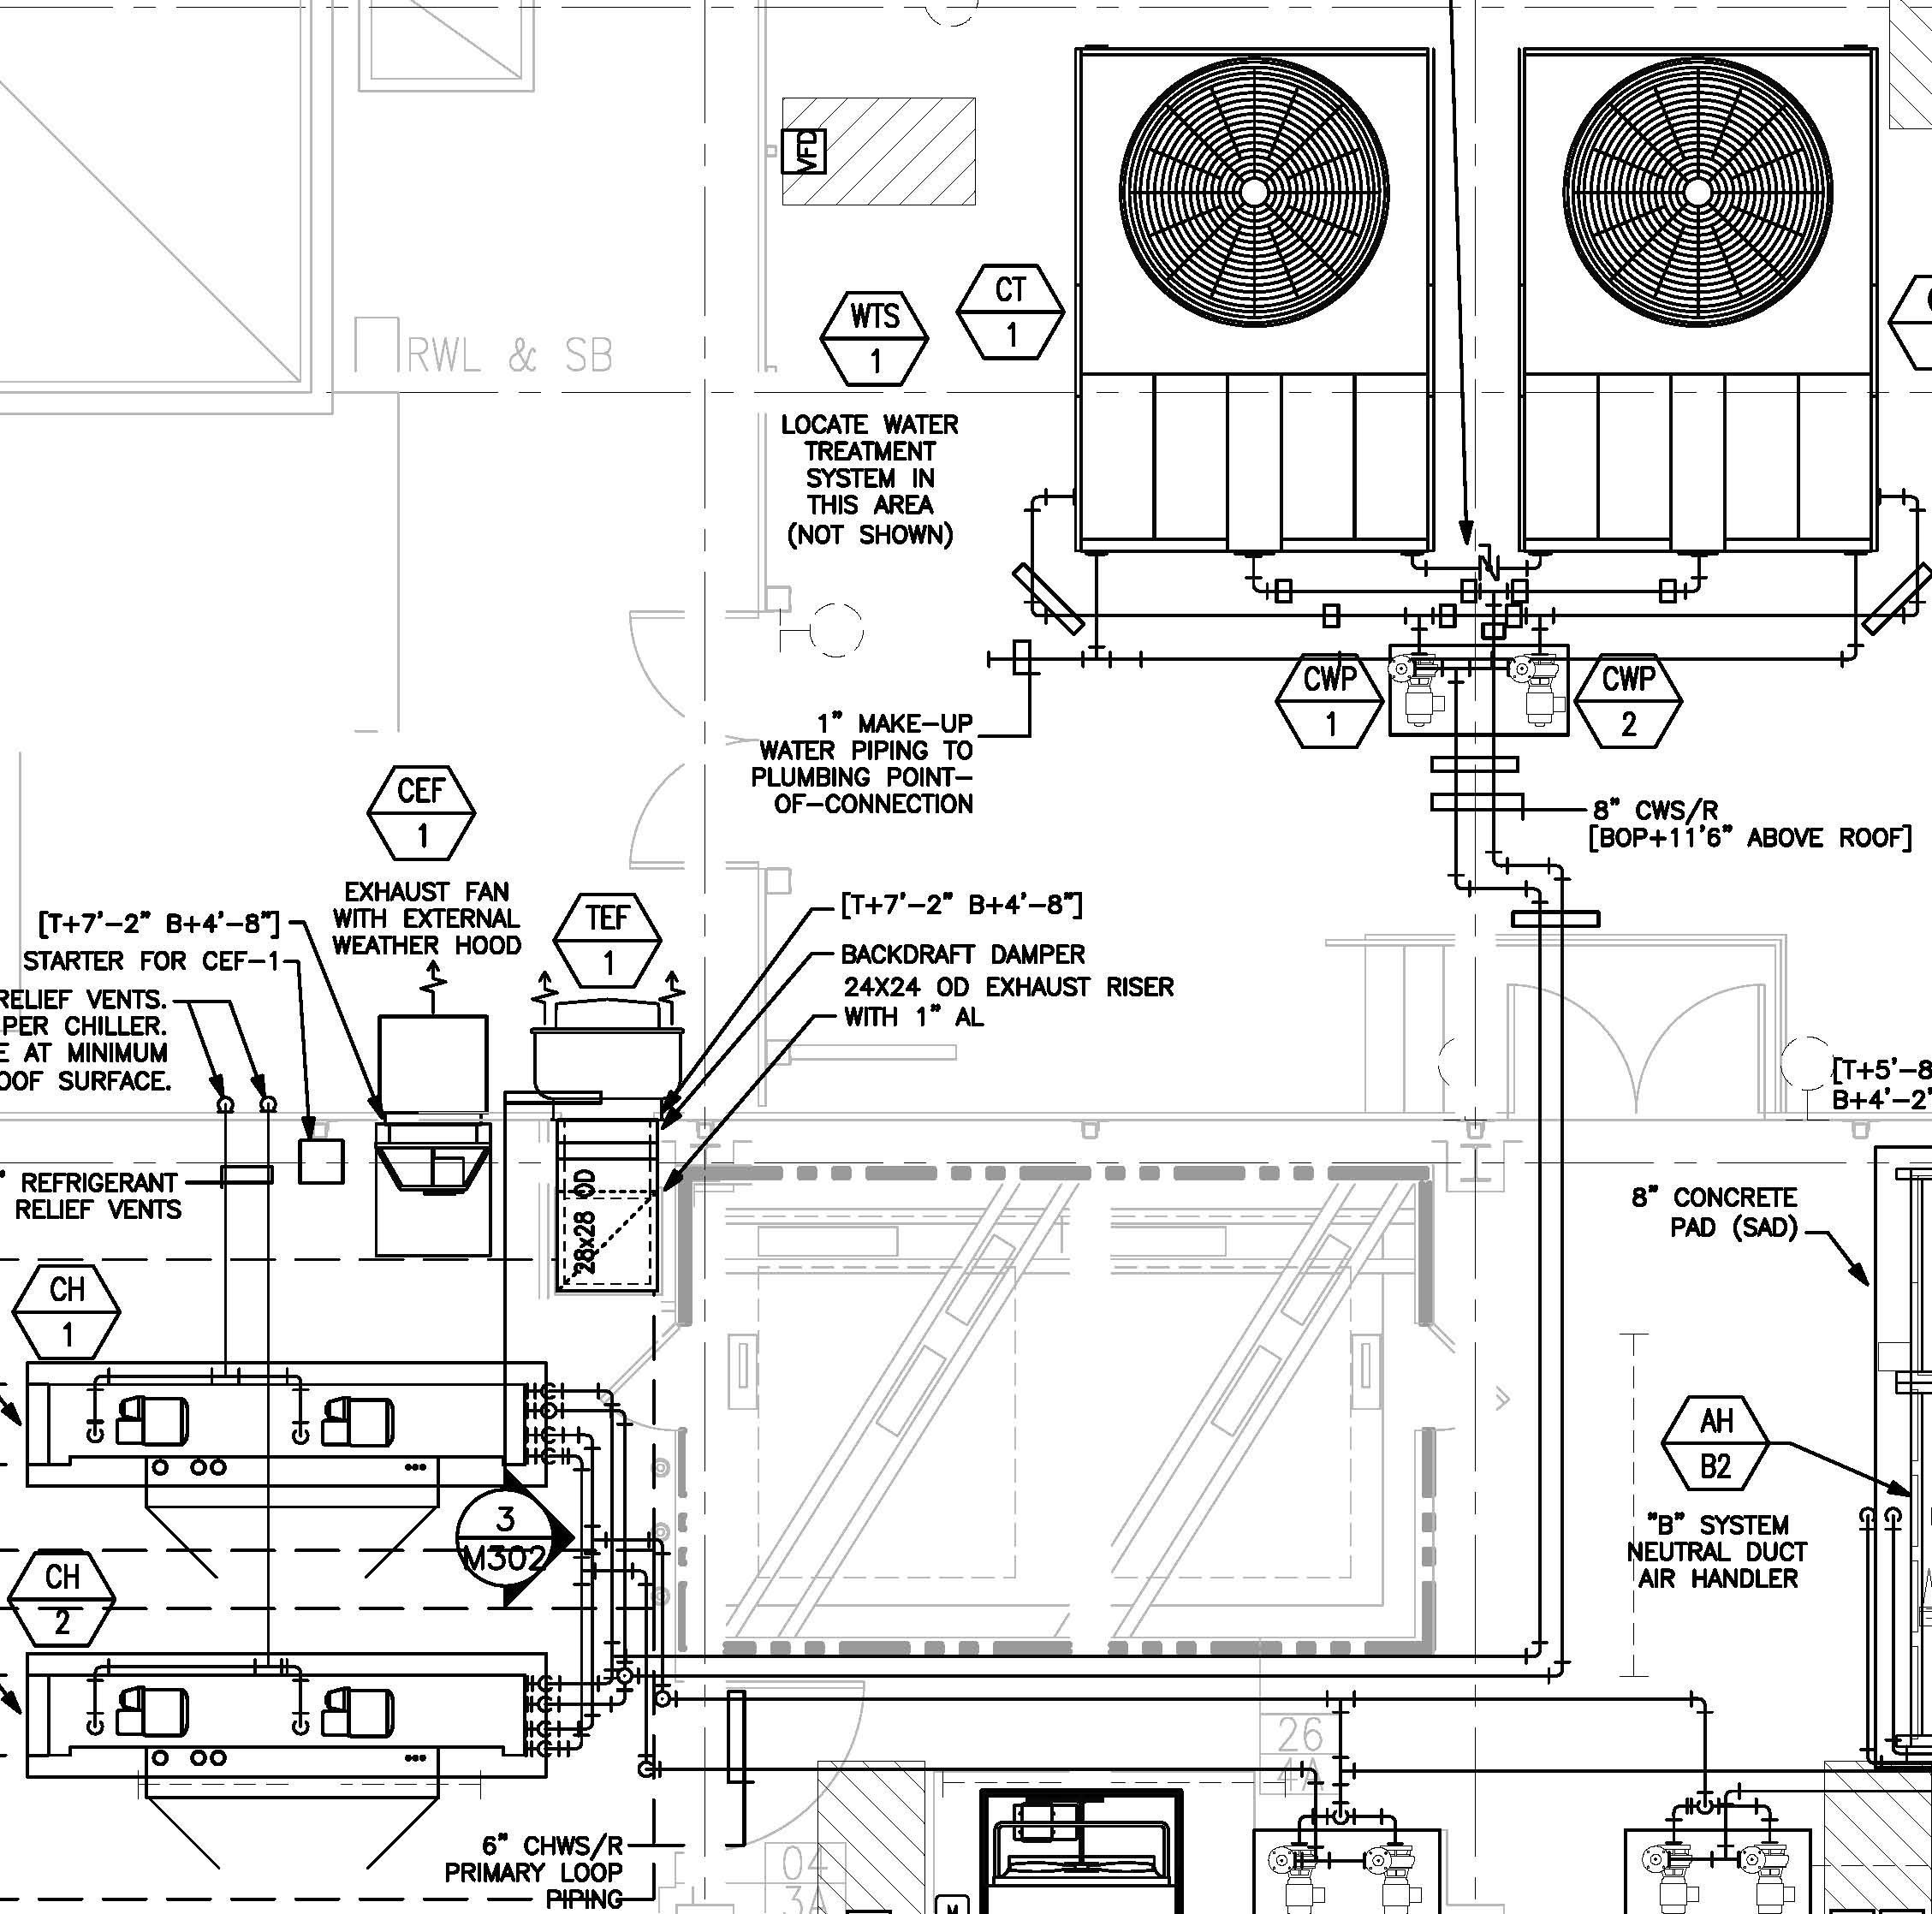 5ef2c9e broan exhaust fans wiring diagram model 678 | wiring resources  wiring resources